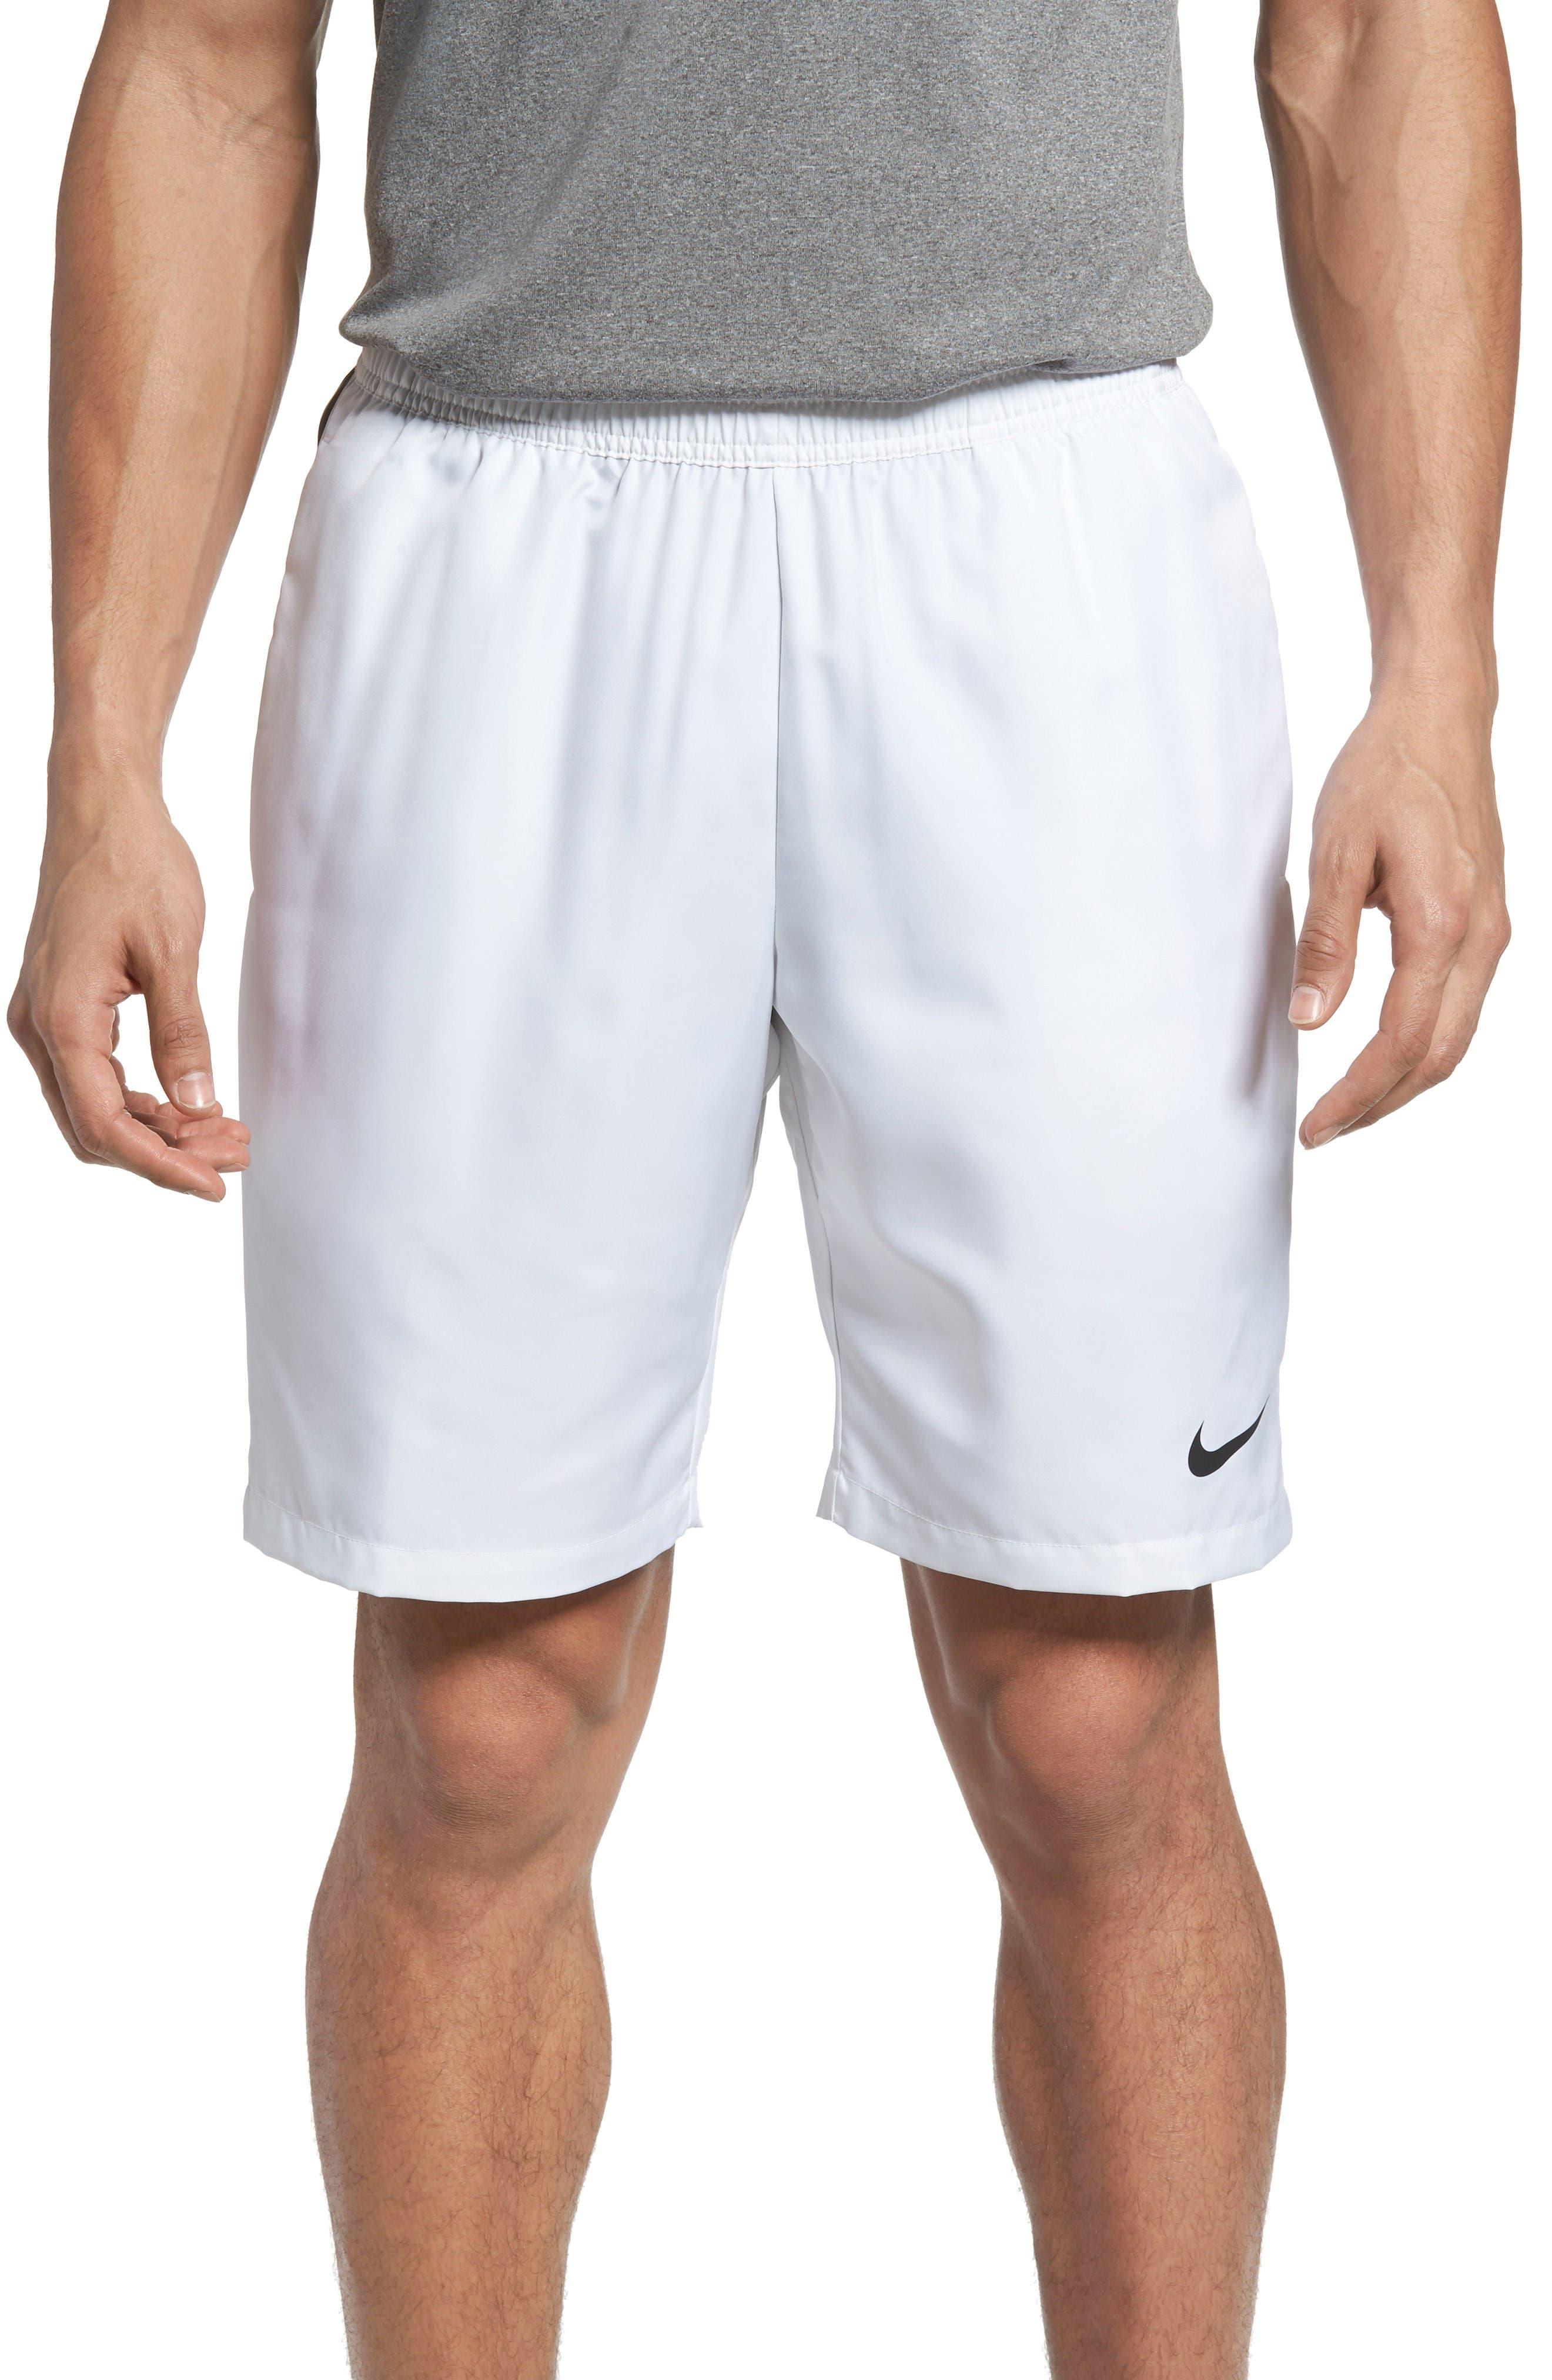 Tennis Shorts,                         Main,                         color, White/ Black